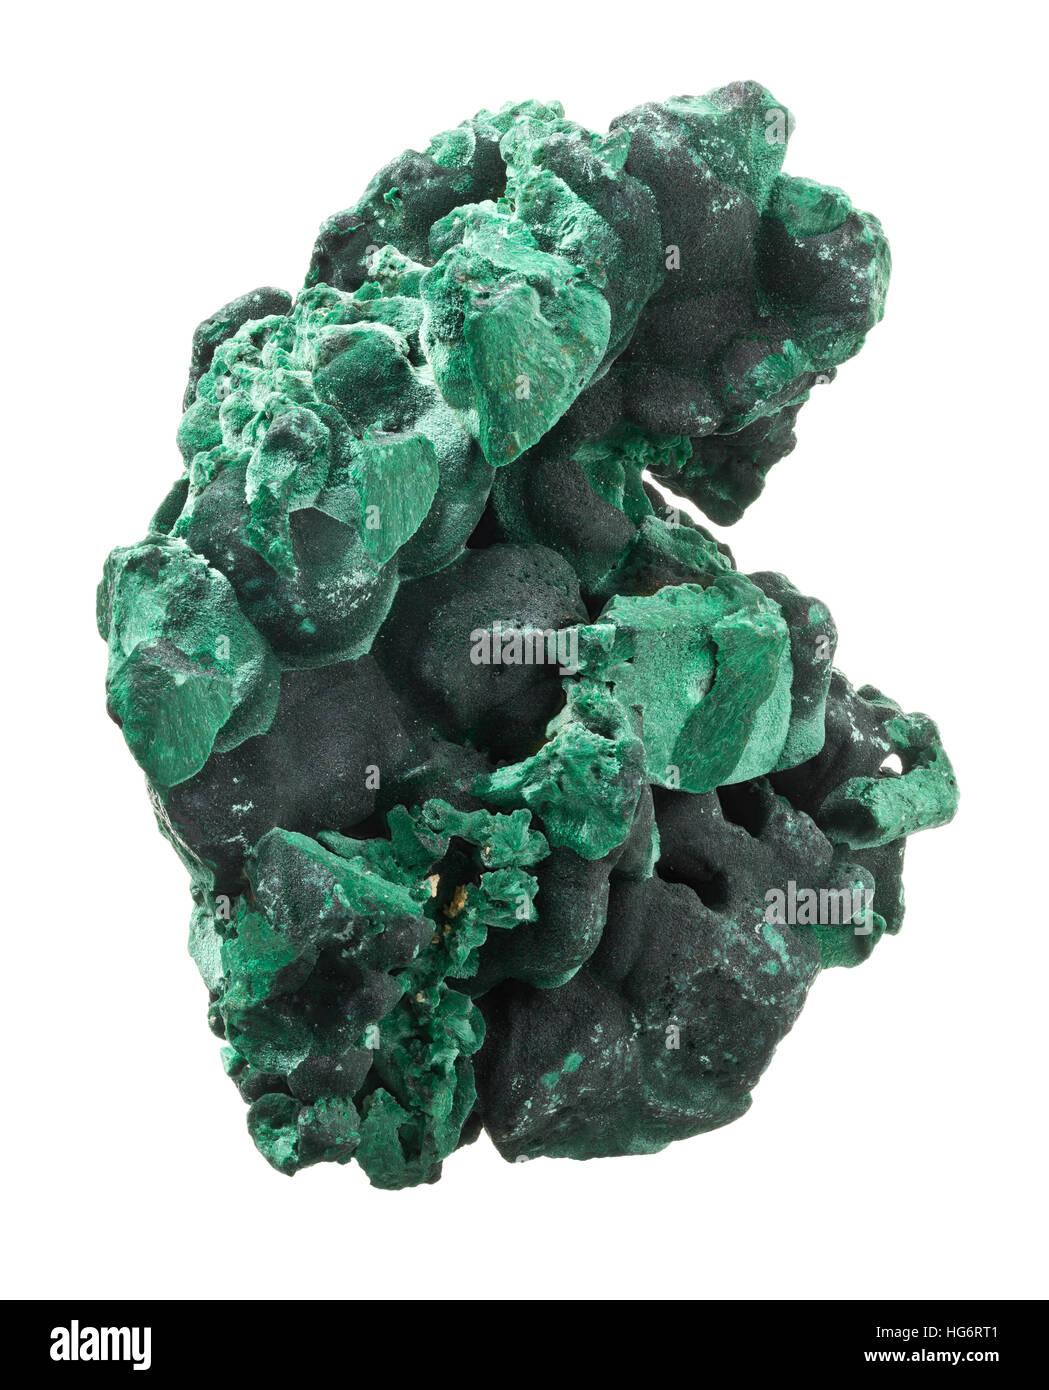 Raw, uncut malachite (cu2co3(oh)2) isolated on white background - Stock Image